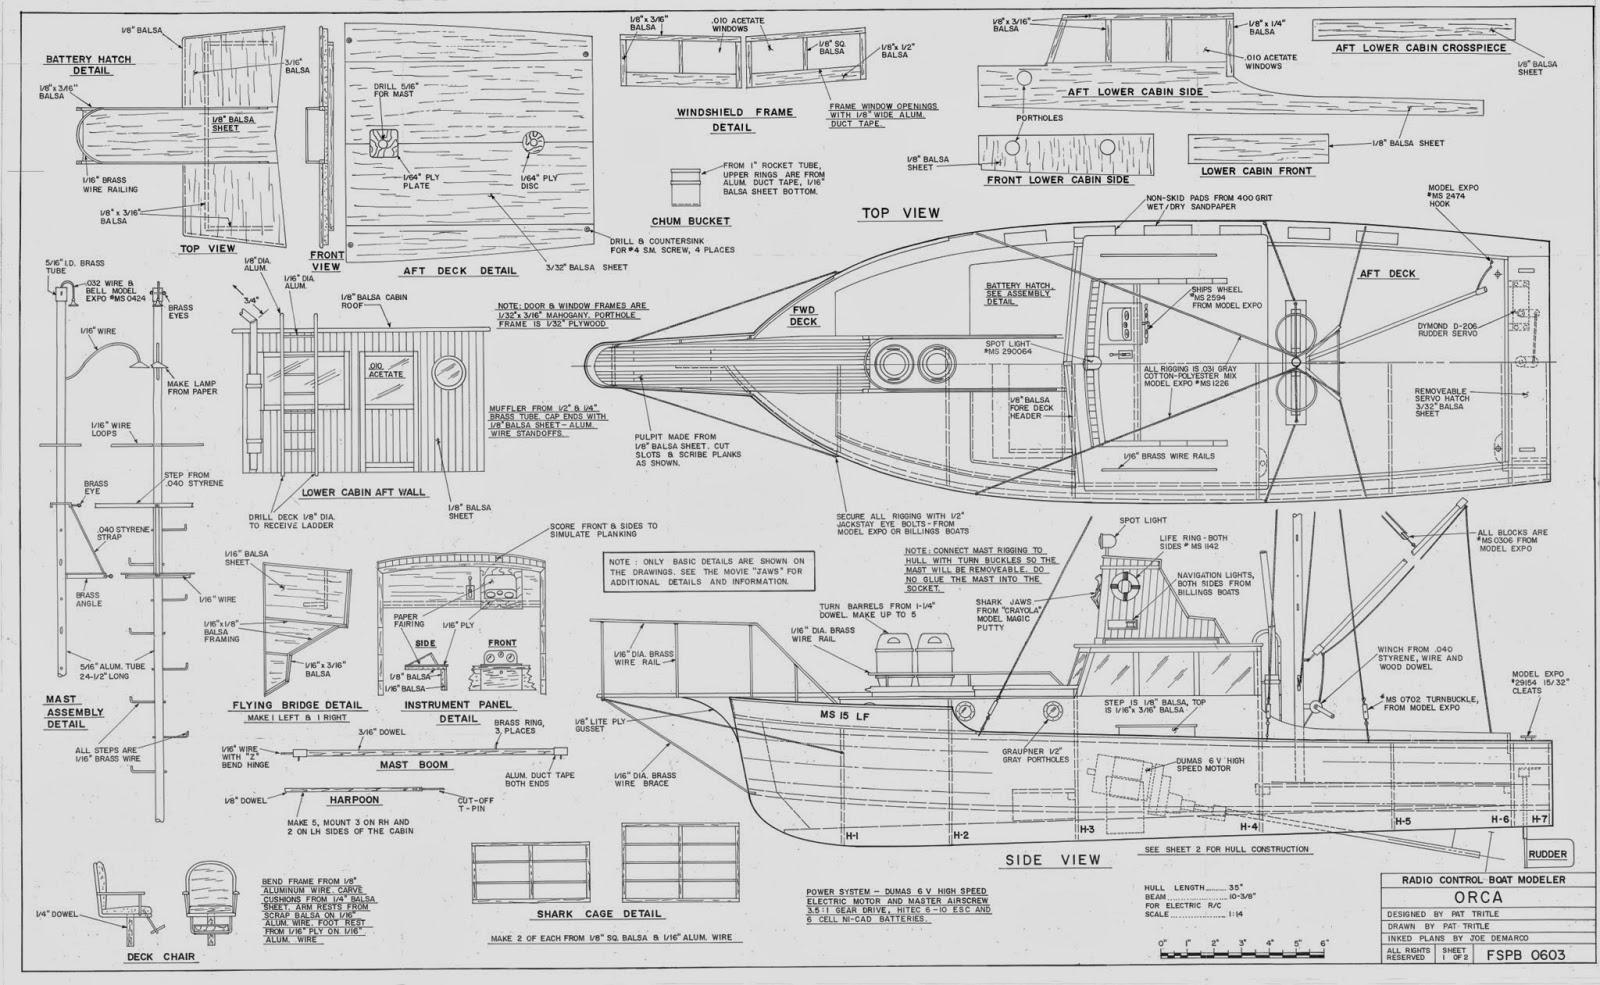 schematics c with Orca Model Boat From Jaws on Minn Kota Endura C2 30 Parts 2015 likewise BSE C 41427 additionally ETA 2 Actis Interceptor Line Art 548577328 likewise Telephones Olderthan500 further Amazinglocaldatingul.